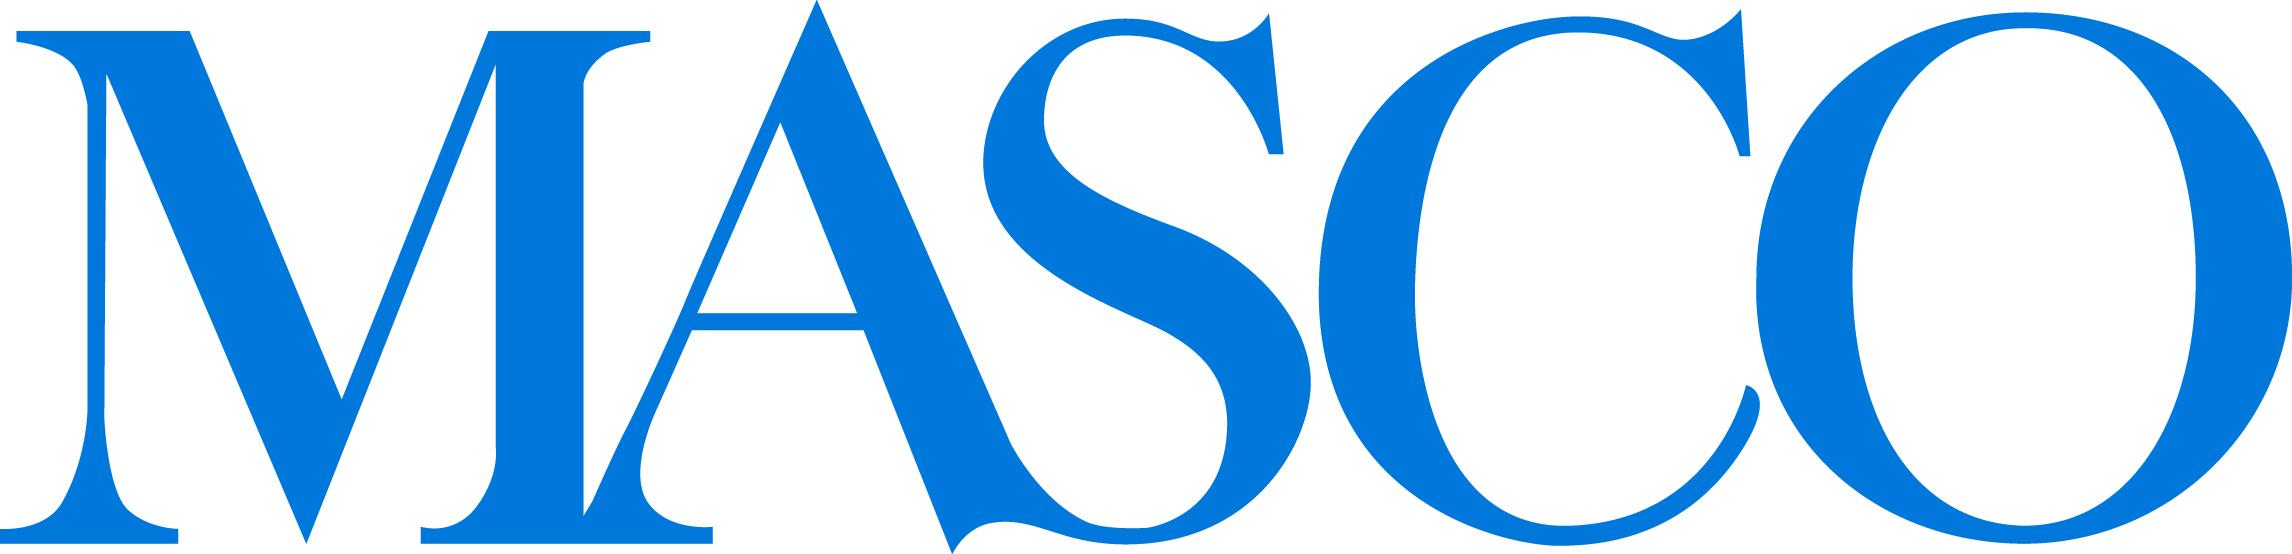 Masco_Logo-grayscale.png